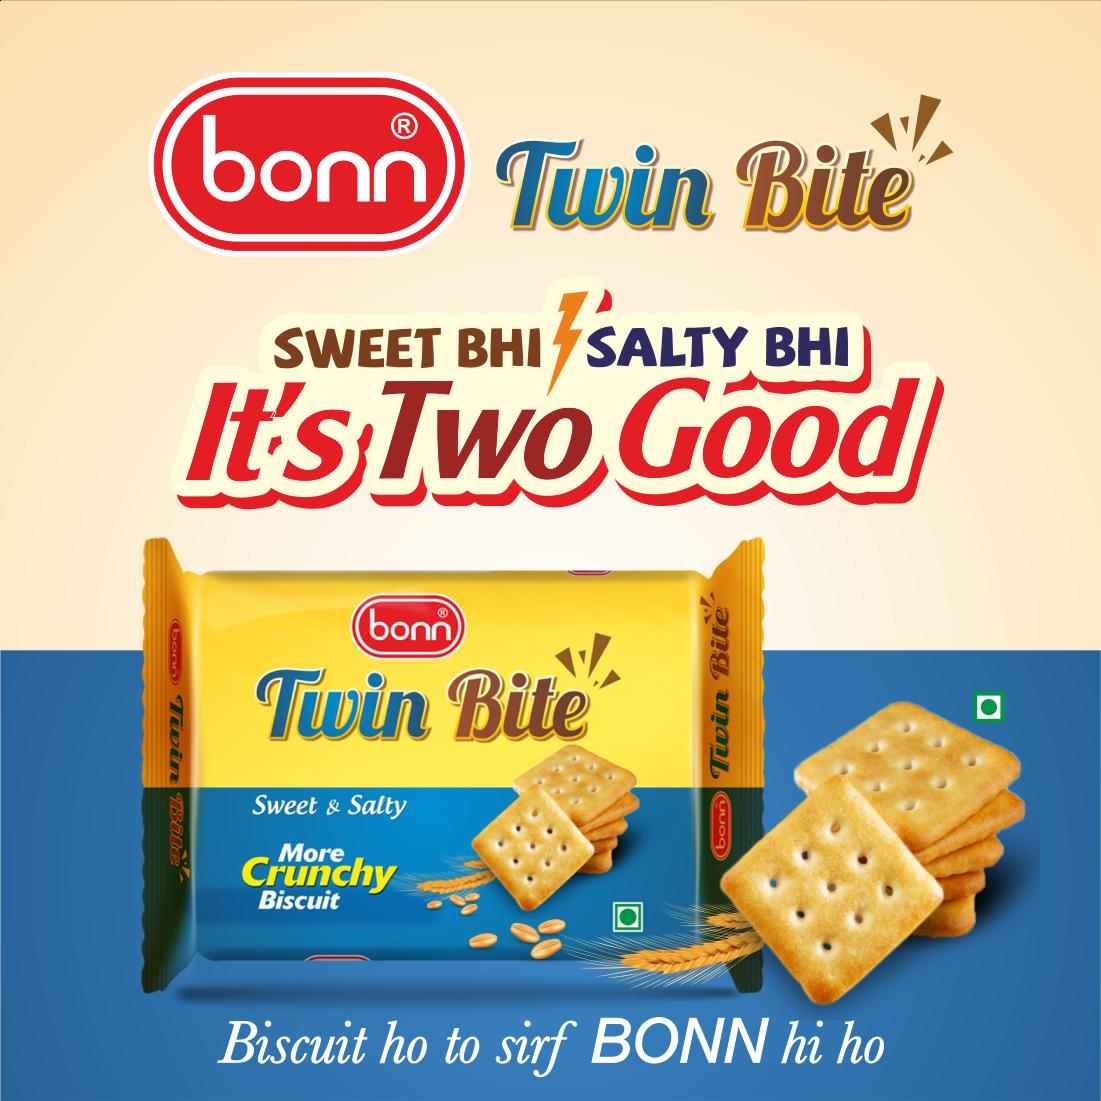 Bonn Twin Bite, Sweet & Salty Cracker Biscuits, 90 g Pack